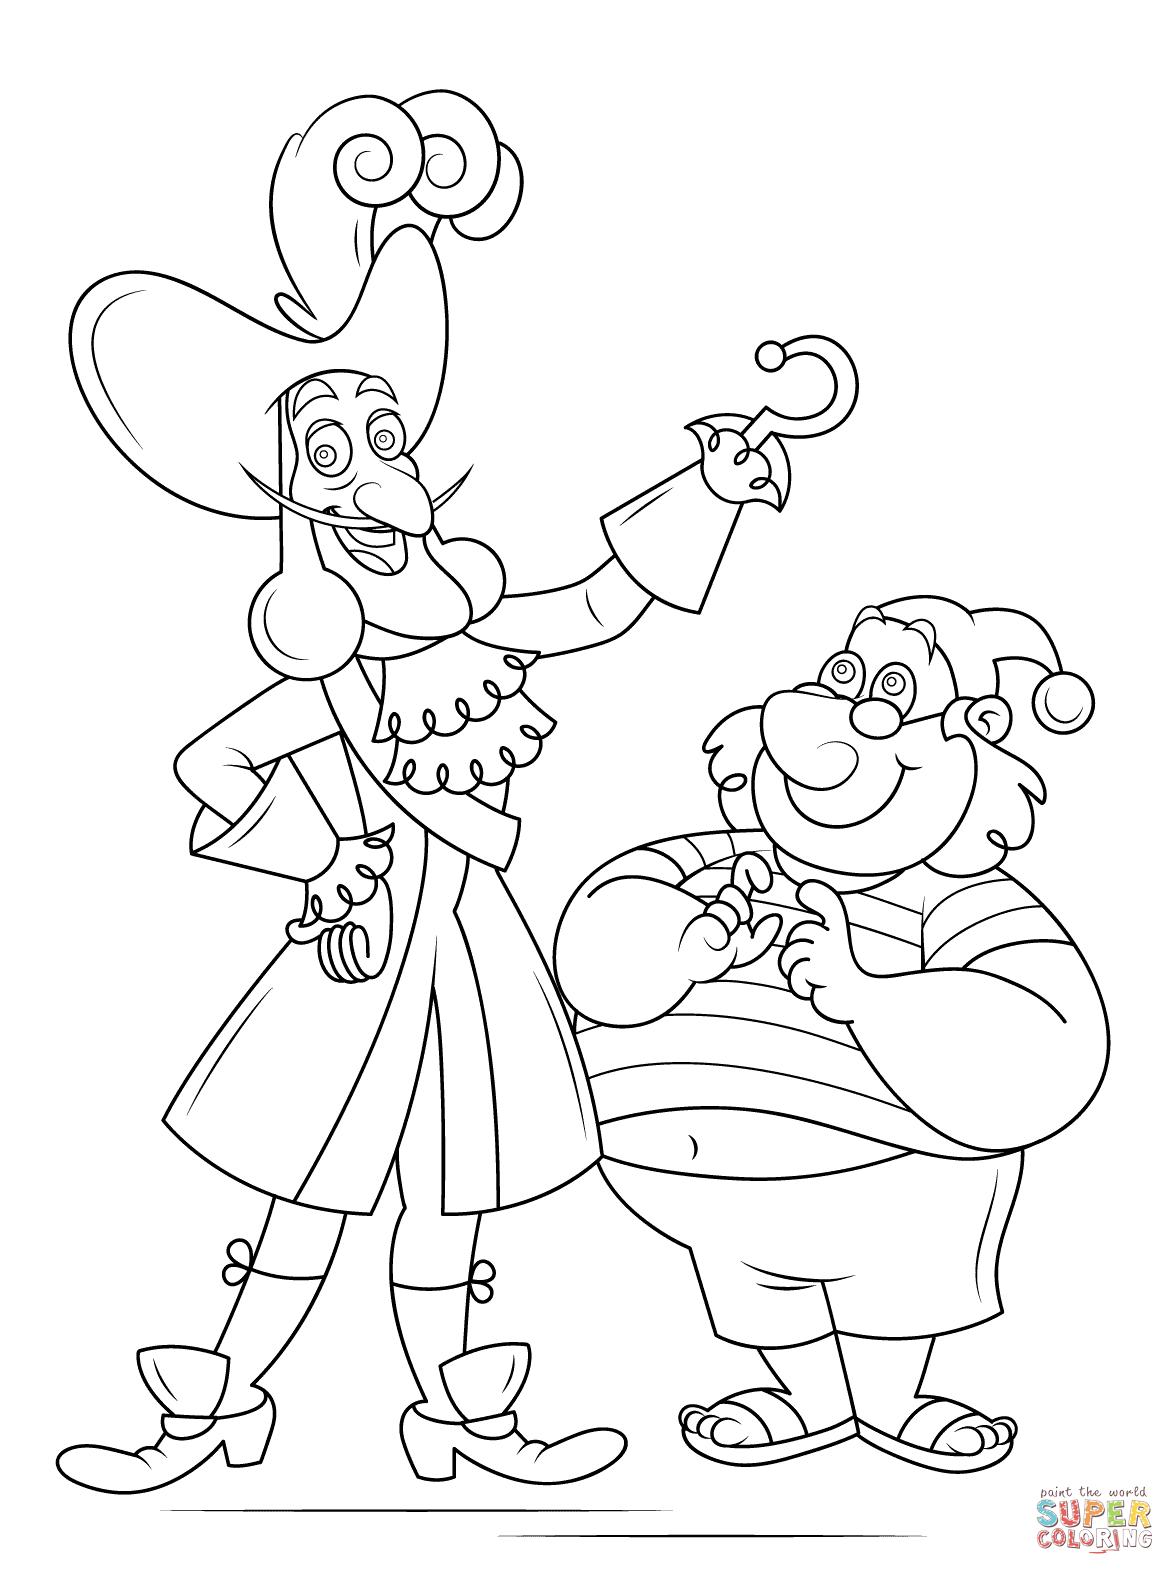 pirate hook drawing at getdrawings  free download